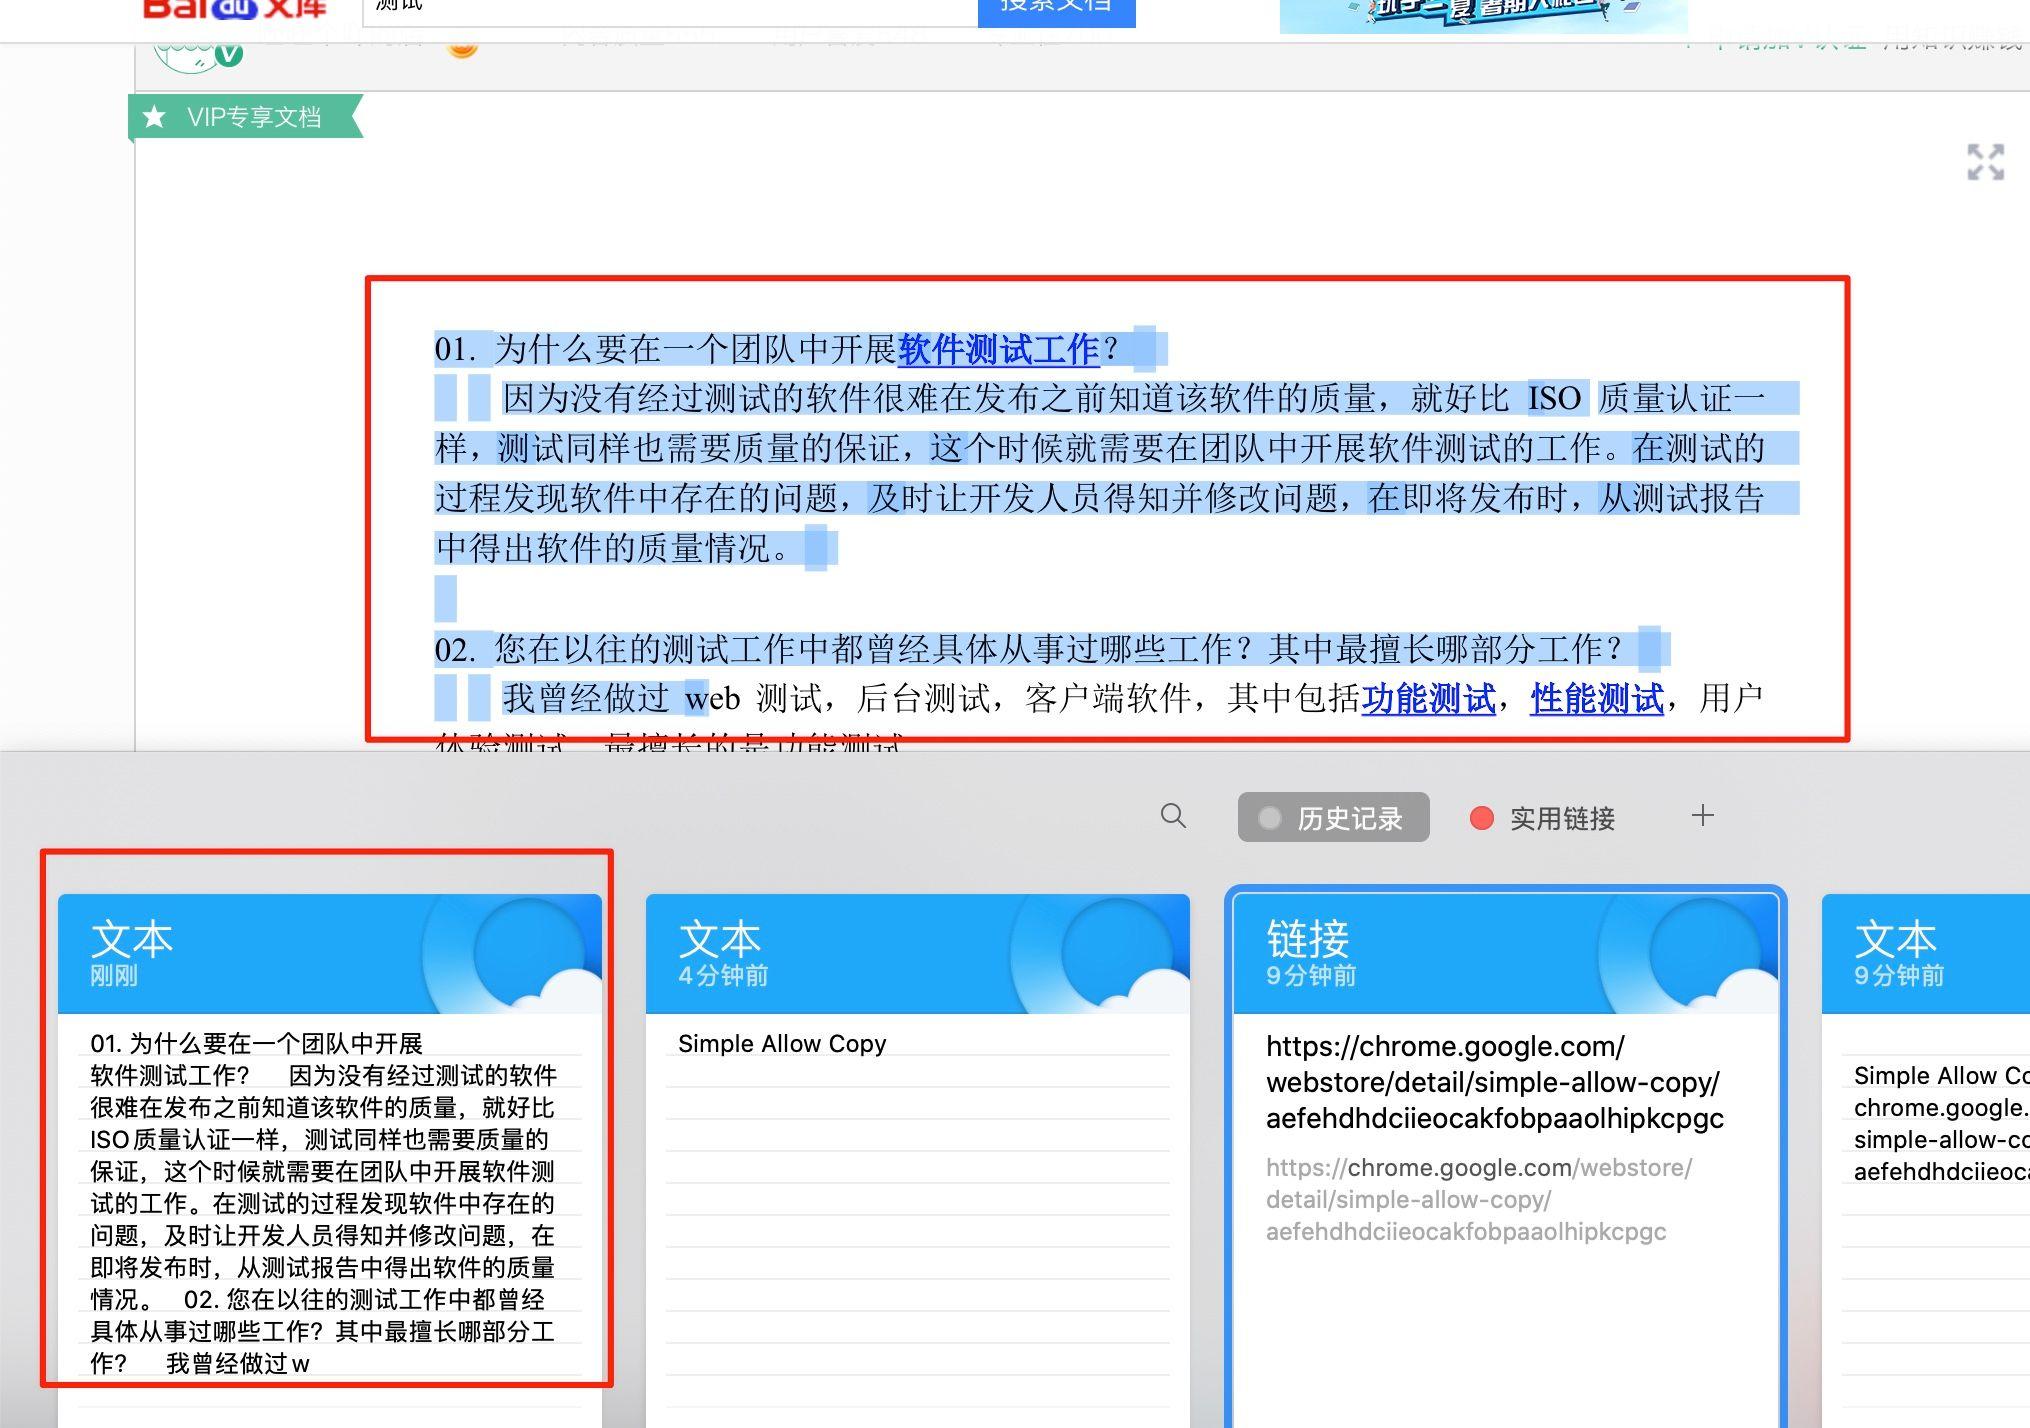 5f2446d16f5f9 - 谷歌浏览器 Simple Allow Copy 插件突破网页右键复制文字限制